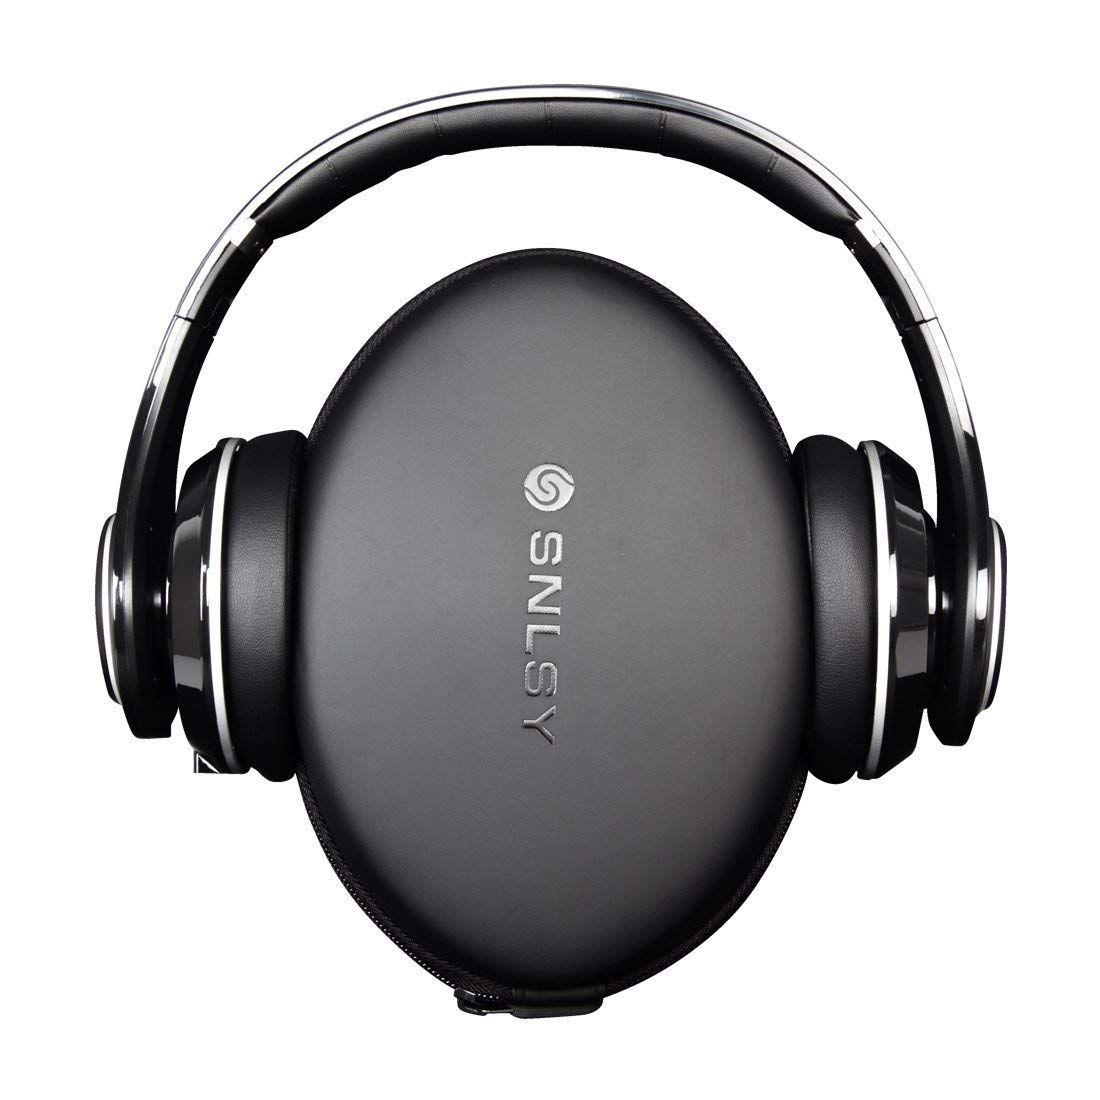 Amazon Com Snlsy Bluetooth Headphones Over Ear Hi Fi Stereo Wireless Headset With Microphone And Volume Cont Wireless Headset Headphones Bluetooth Headphones